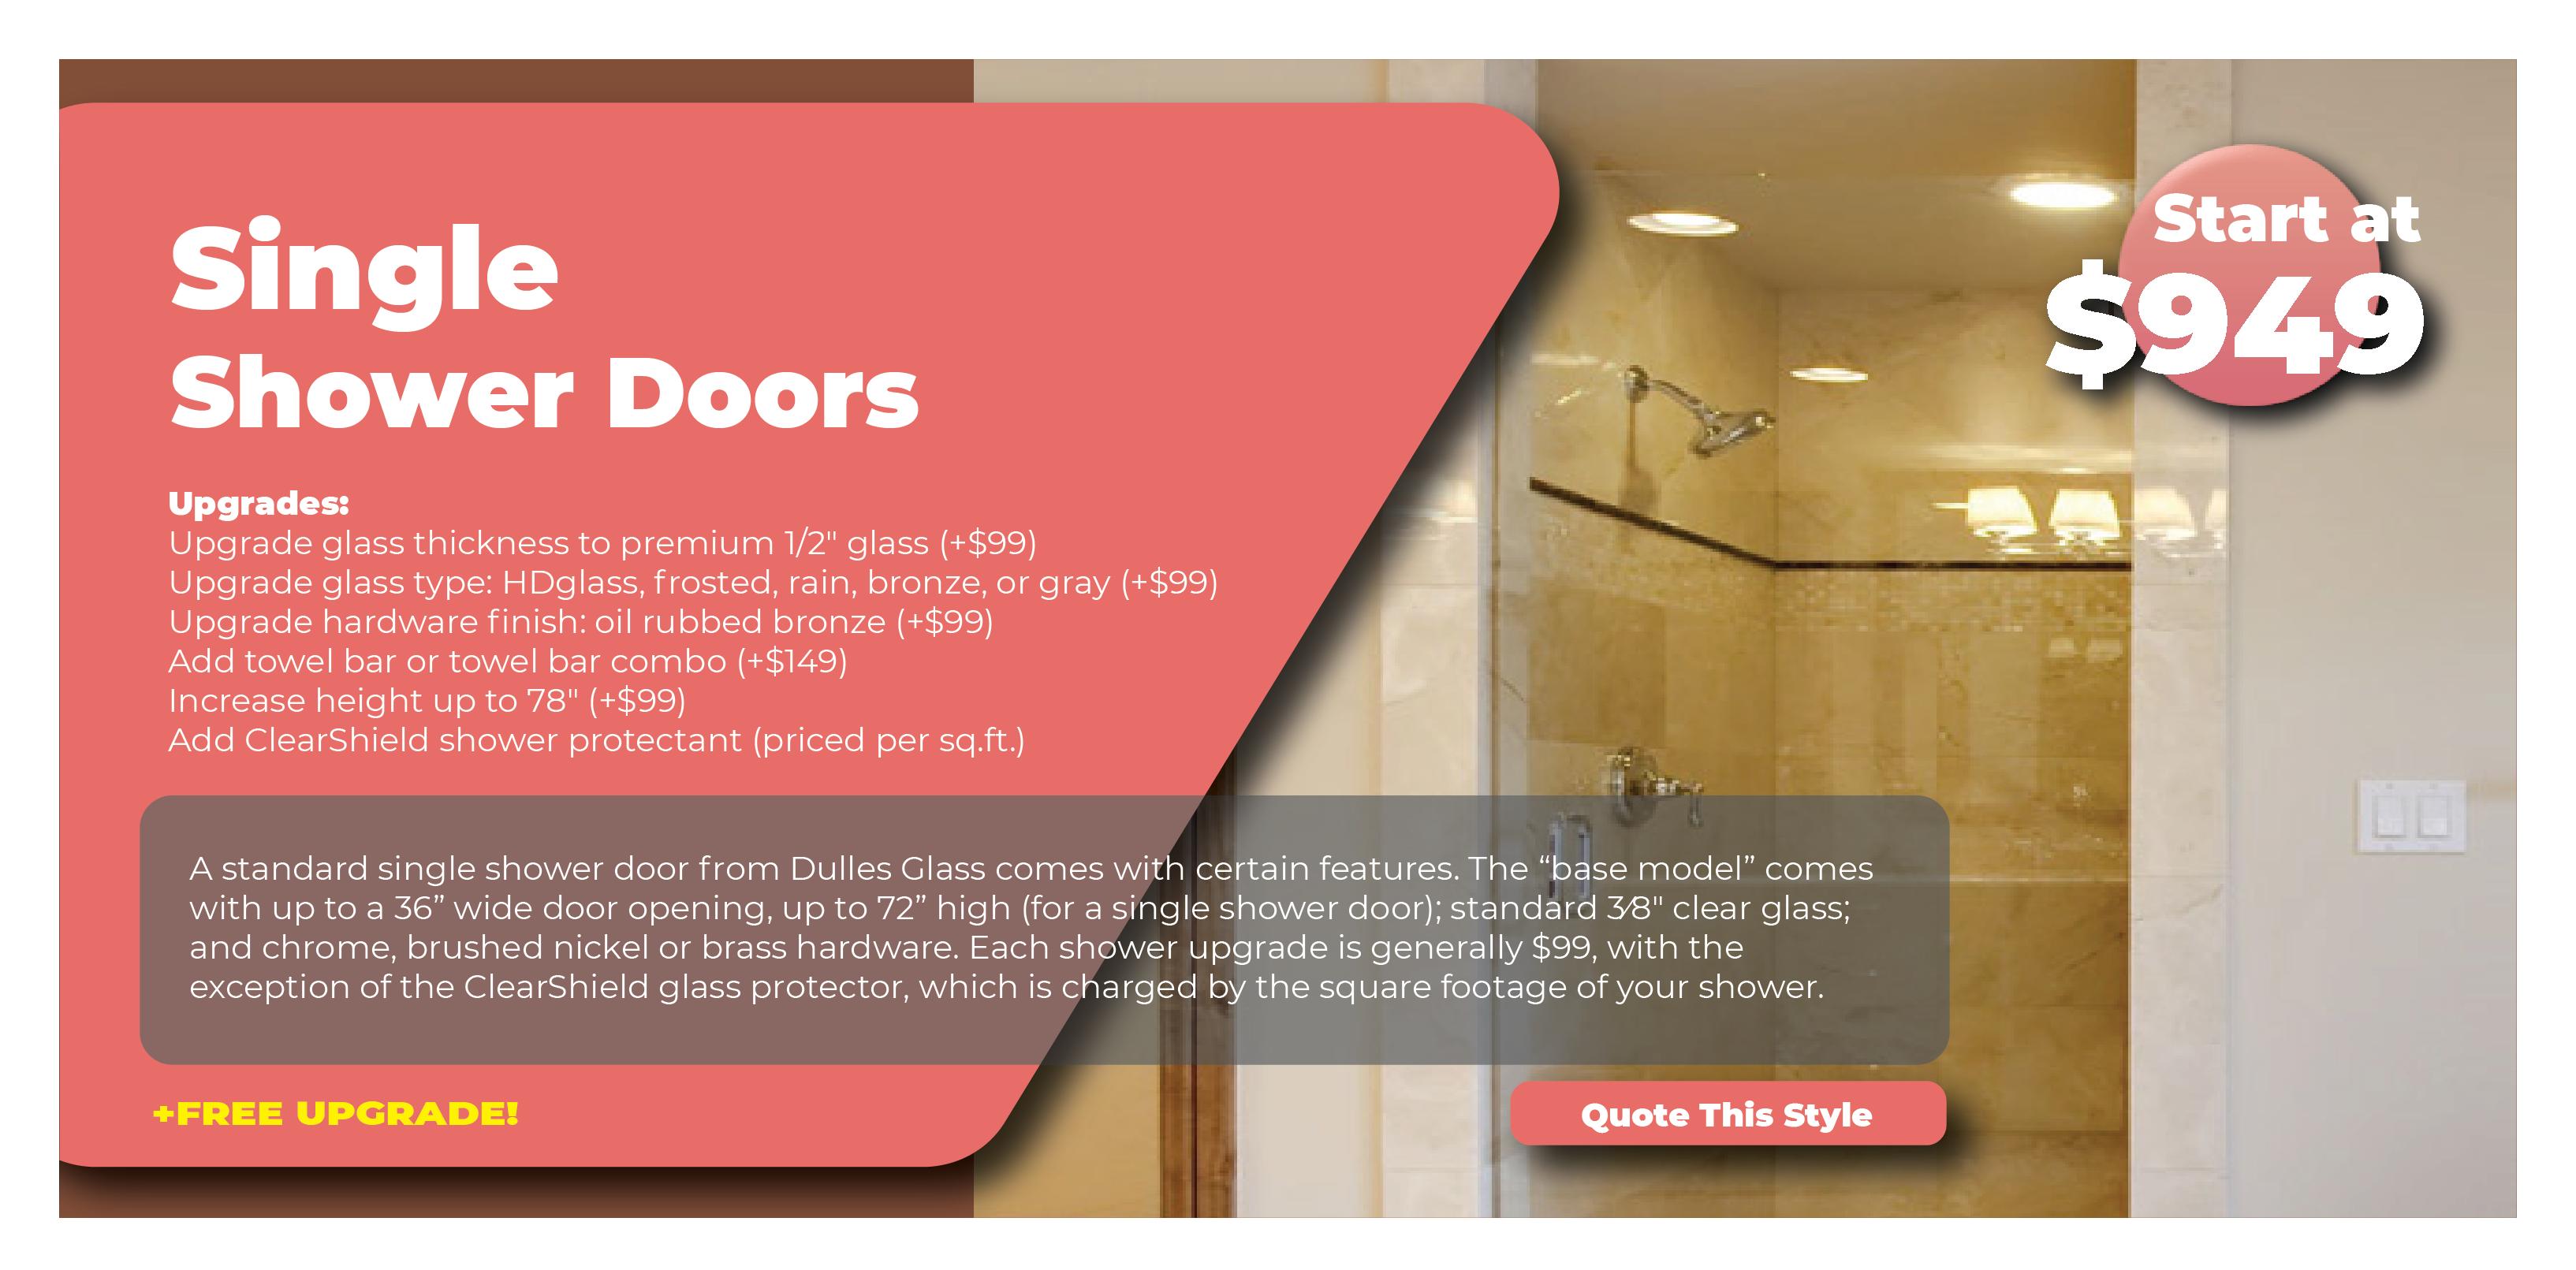 Single Shower Doors Promo